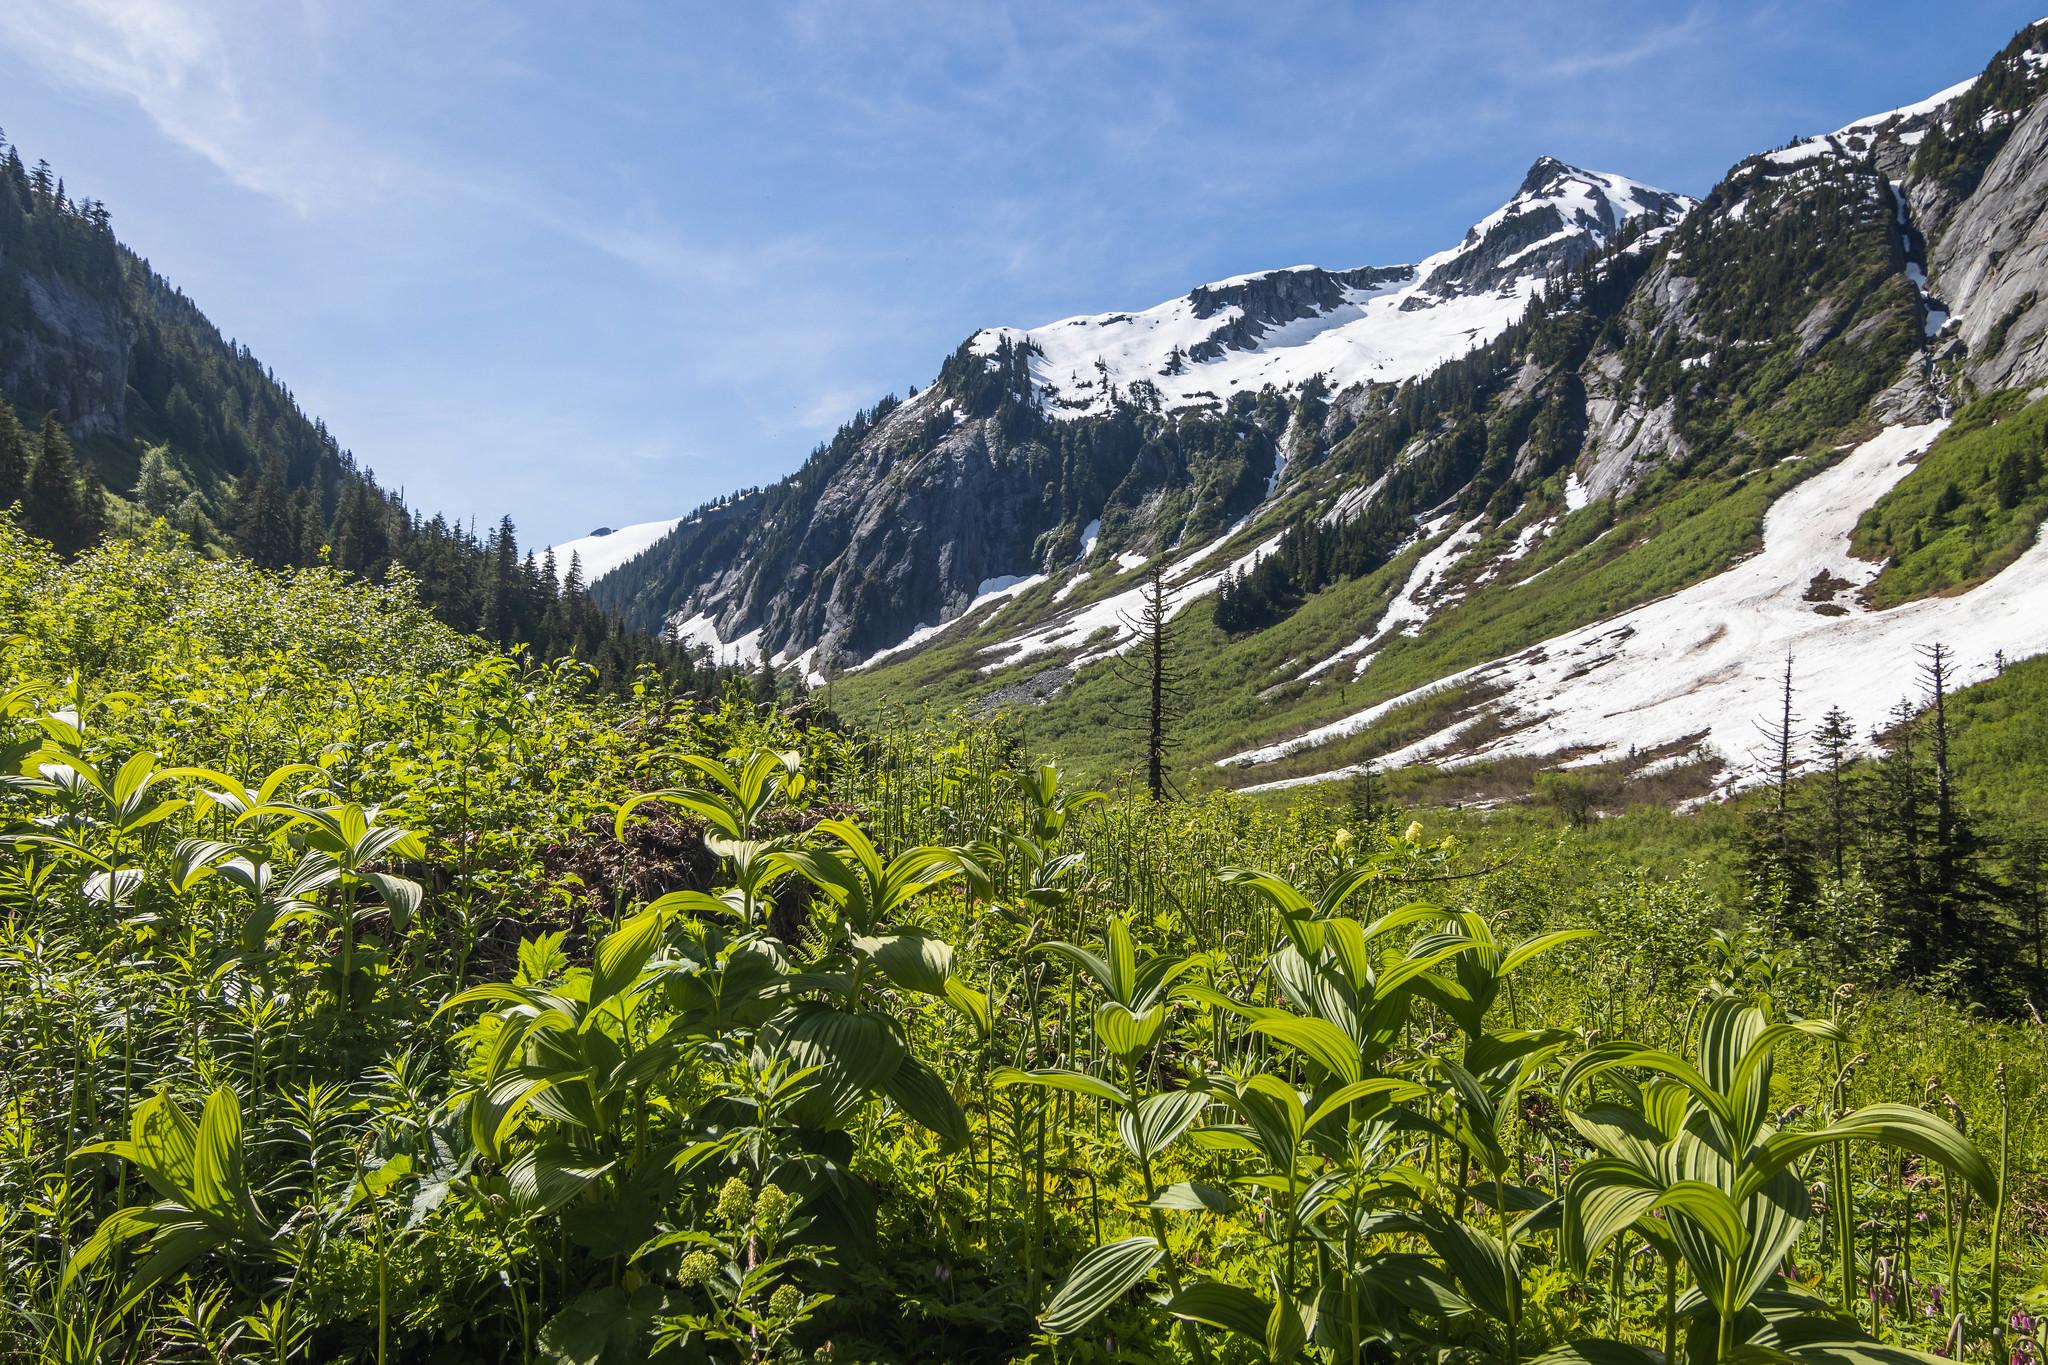 Hannegan Pass through Ruth Creek Valley